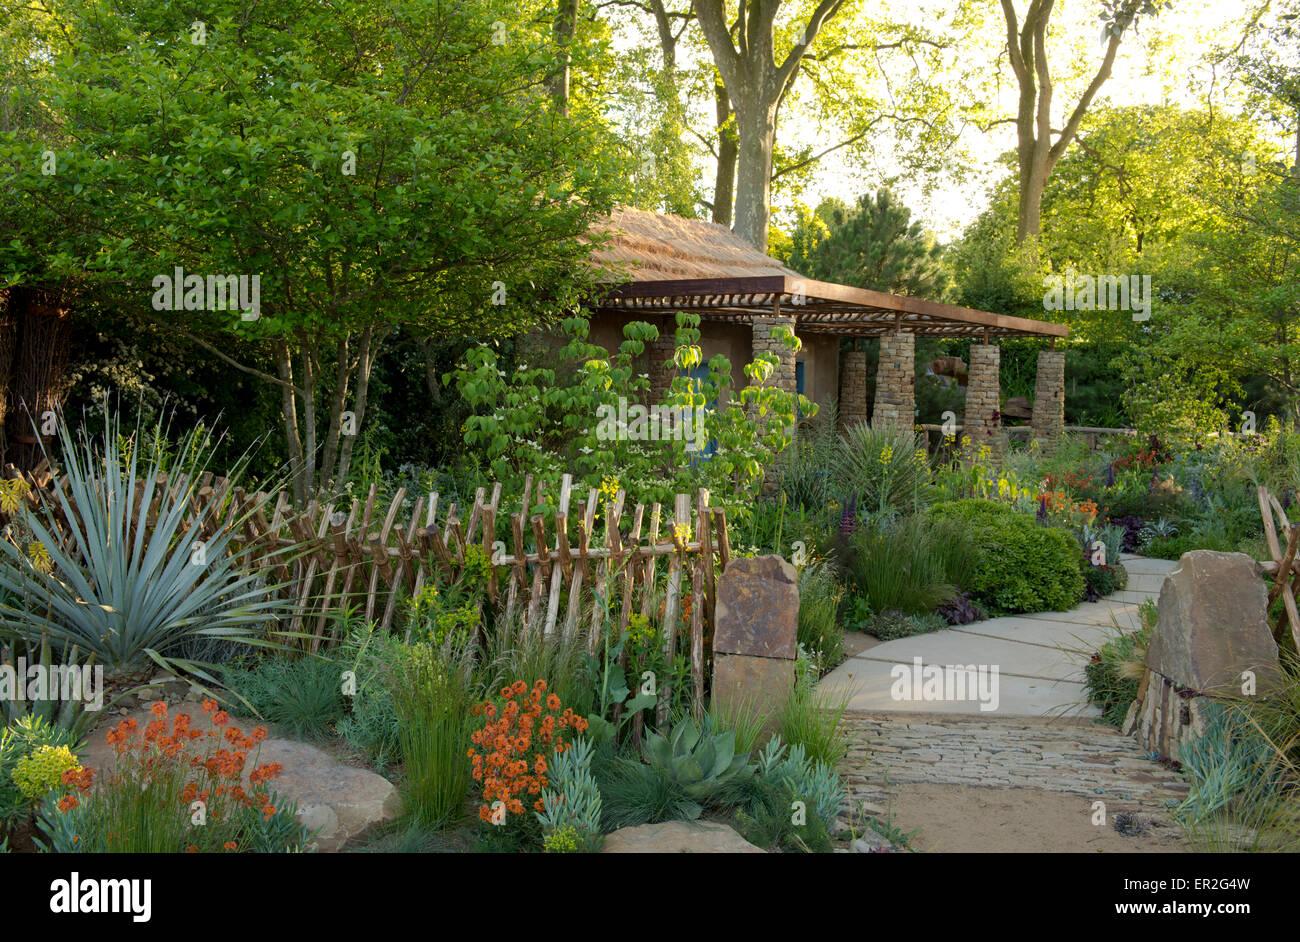 The Sentebale-Hope in Vulnerability Garden designed by Matt Keightly at The Chelsea Flower Show, London, UK 2015. - Stock Image